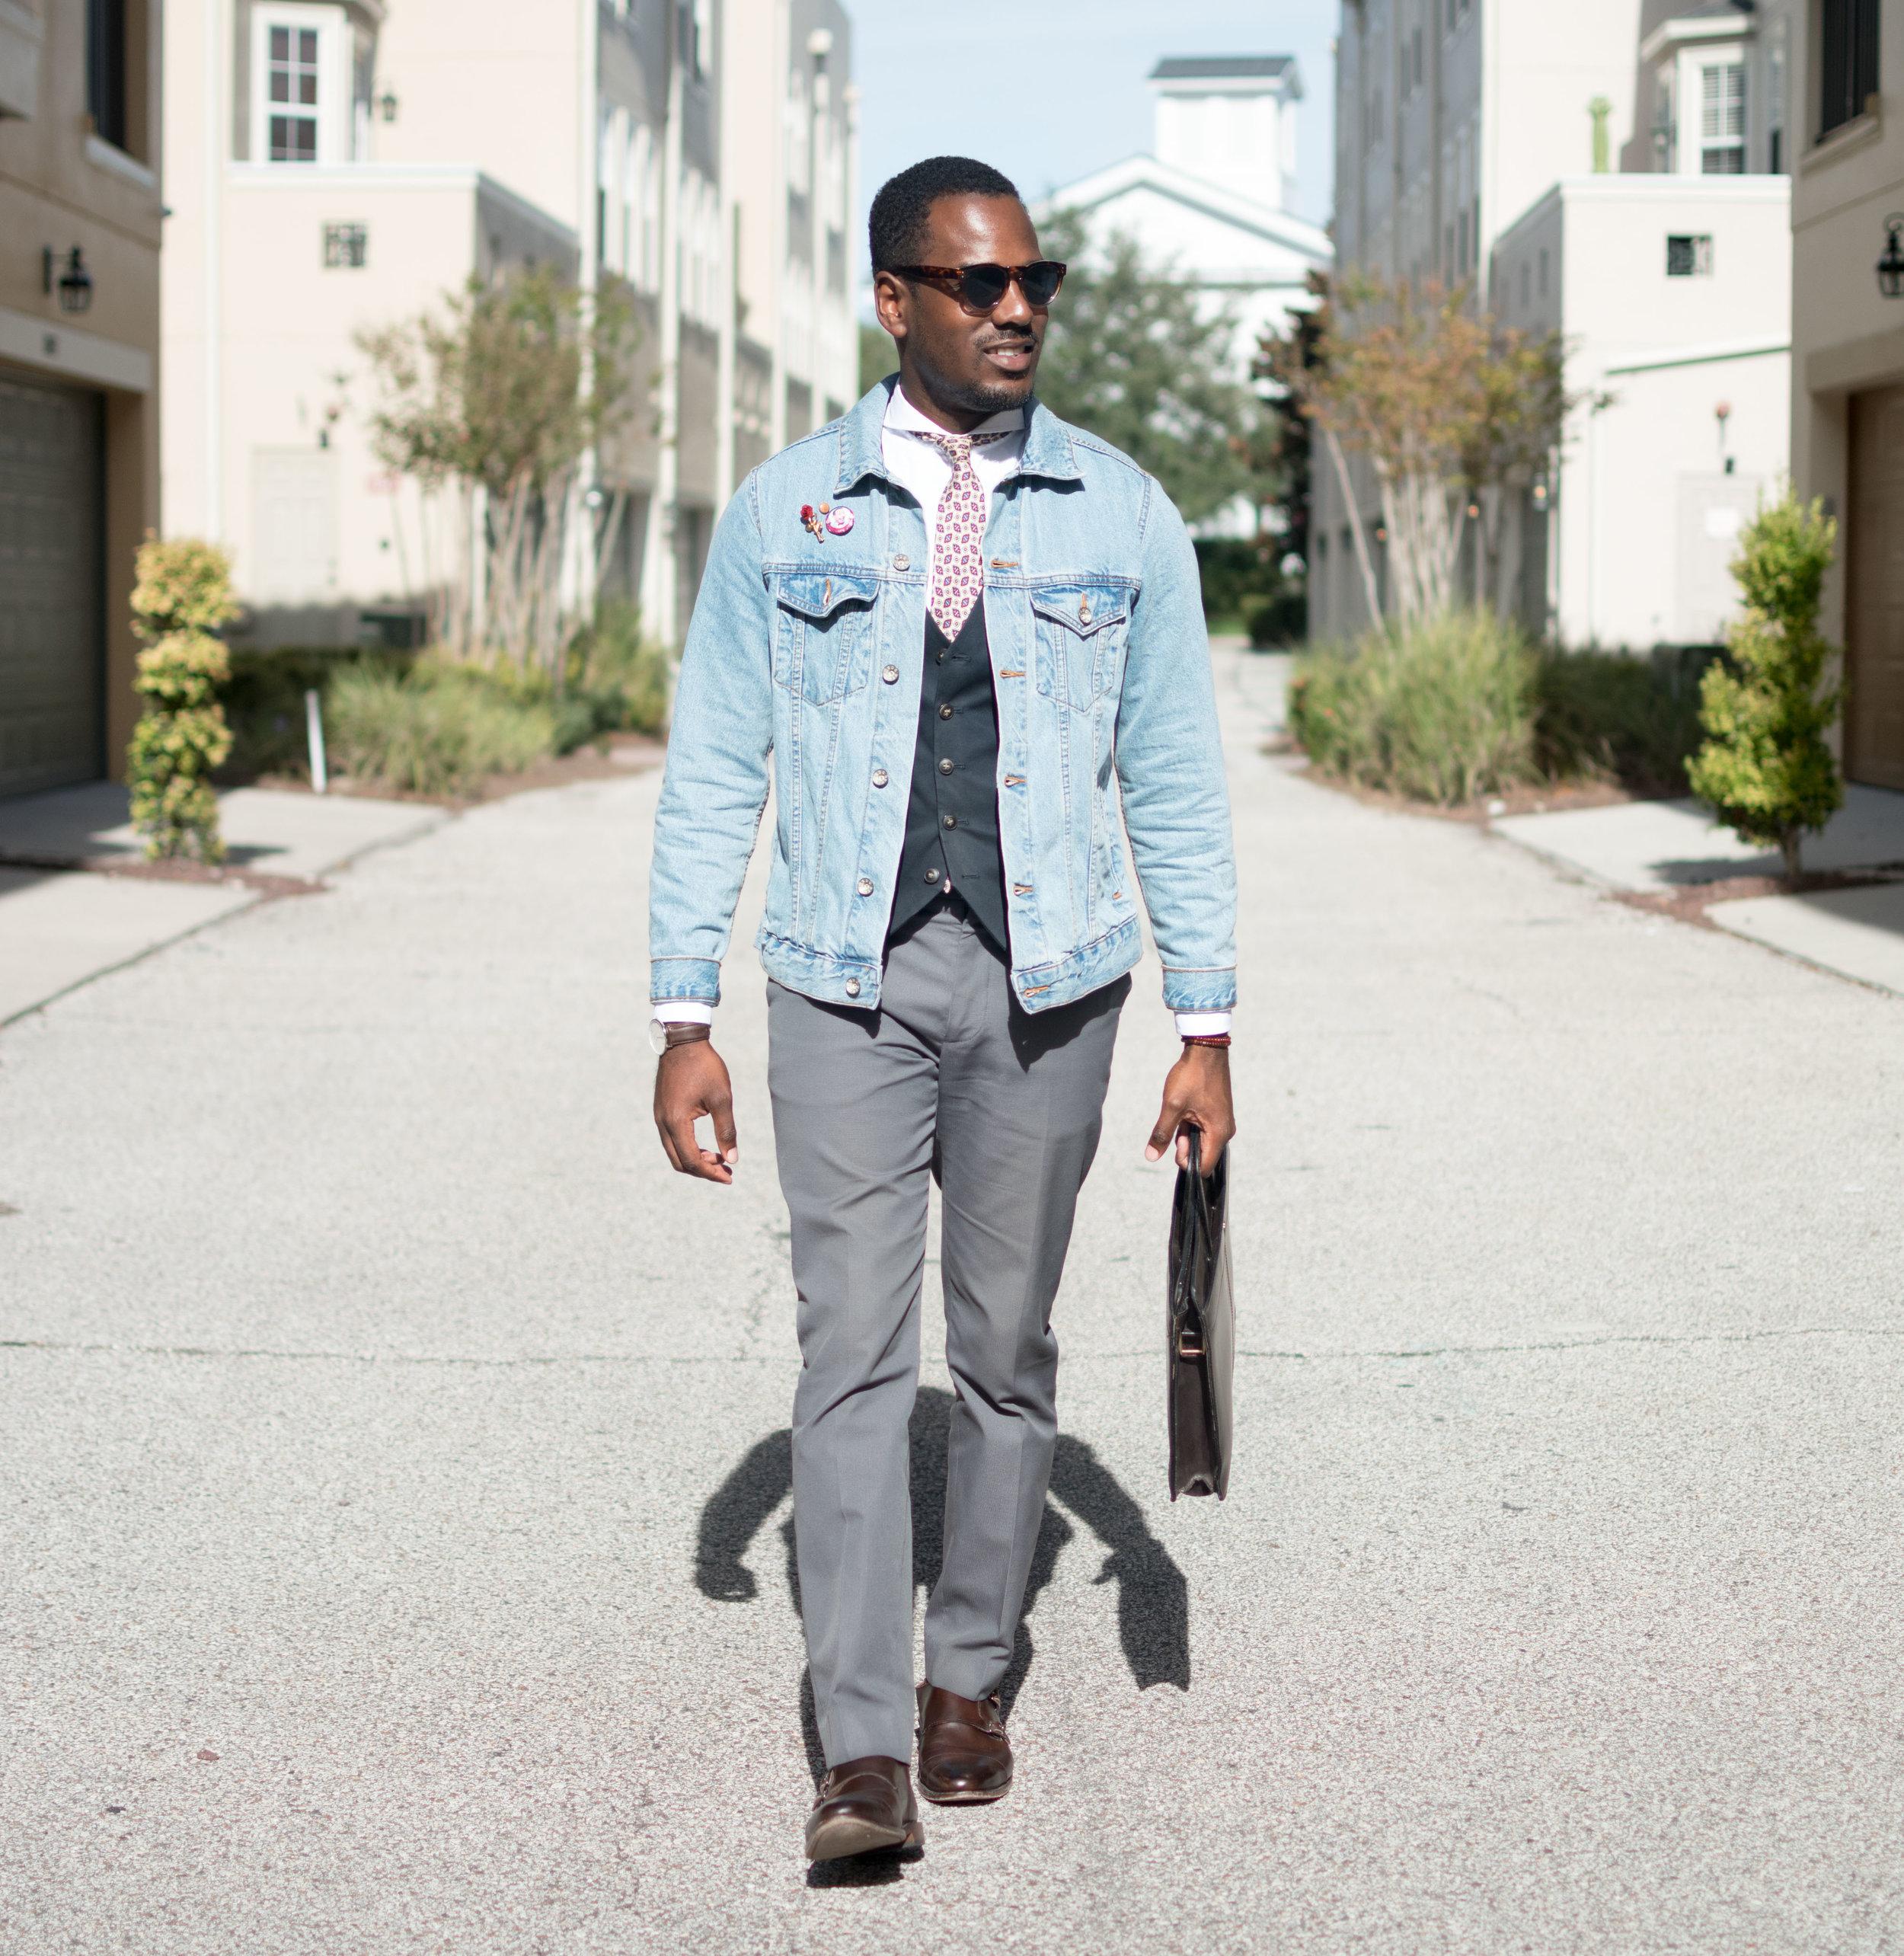 denim jacket style.jpg